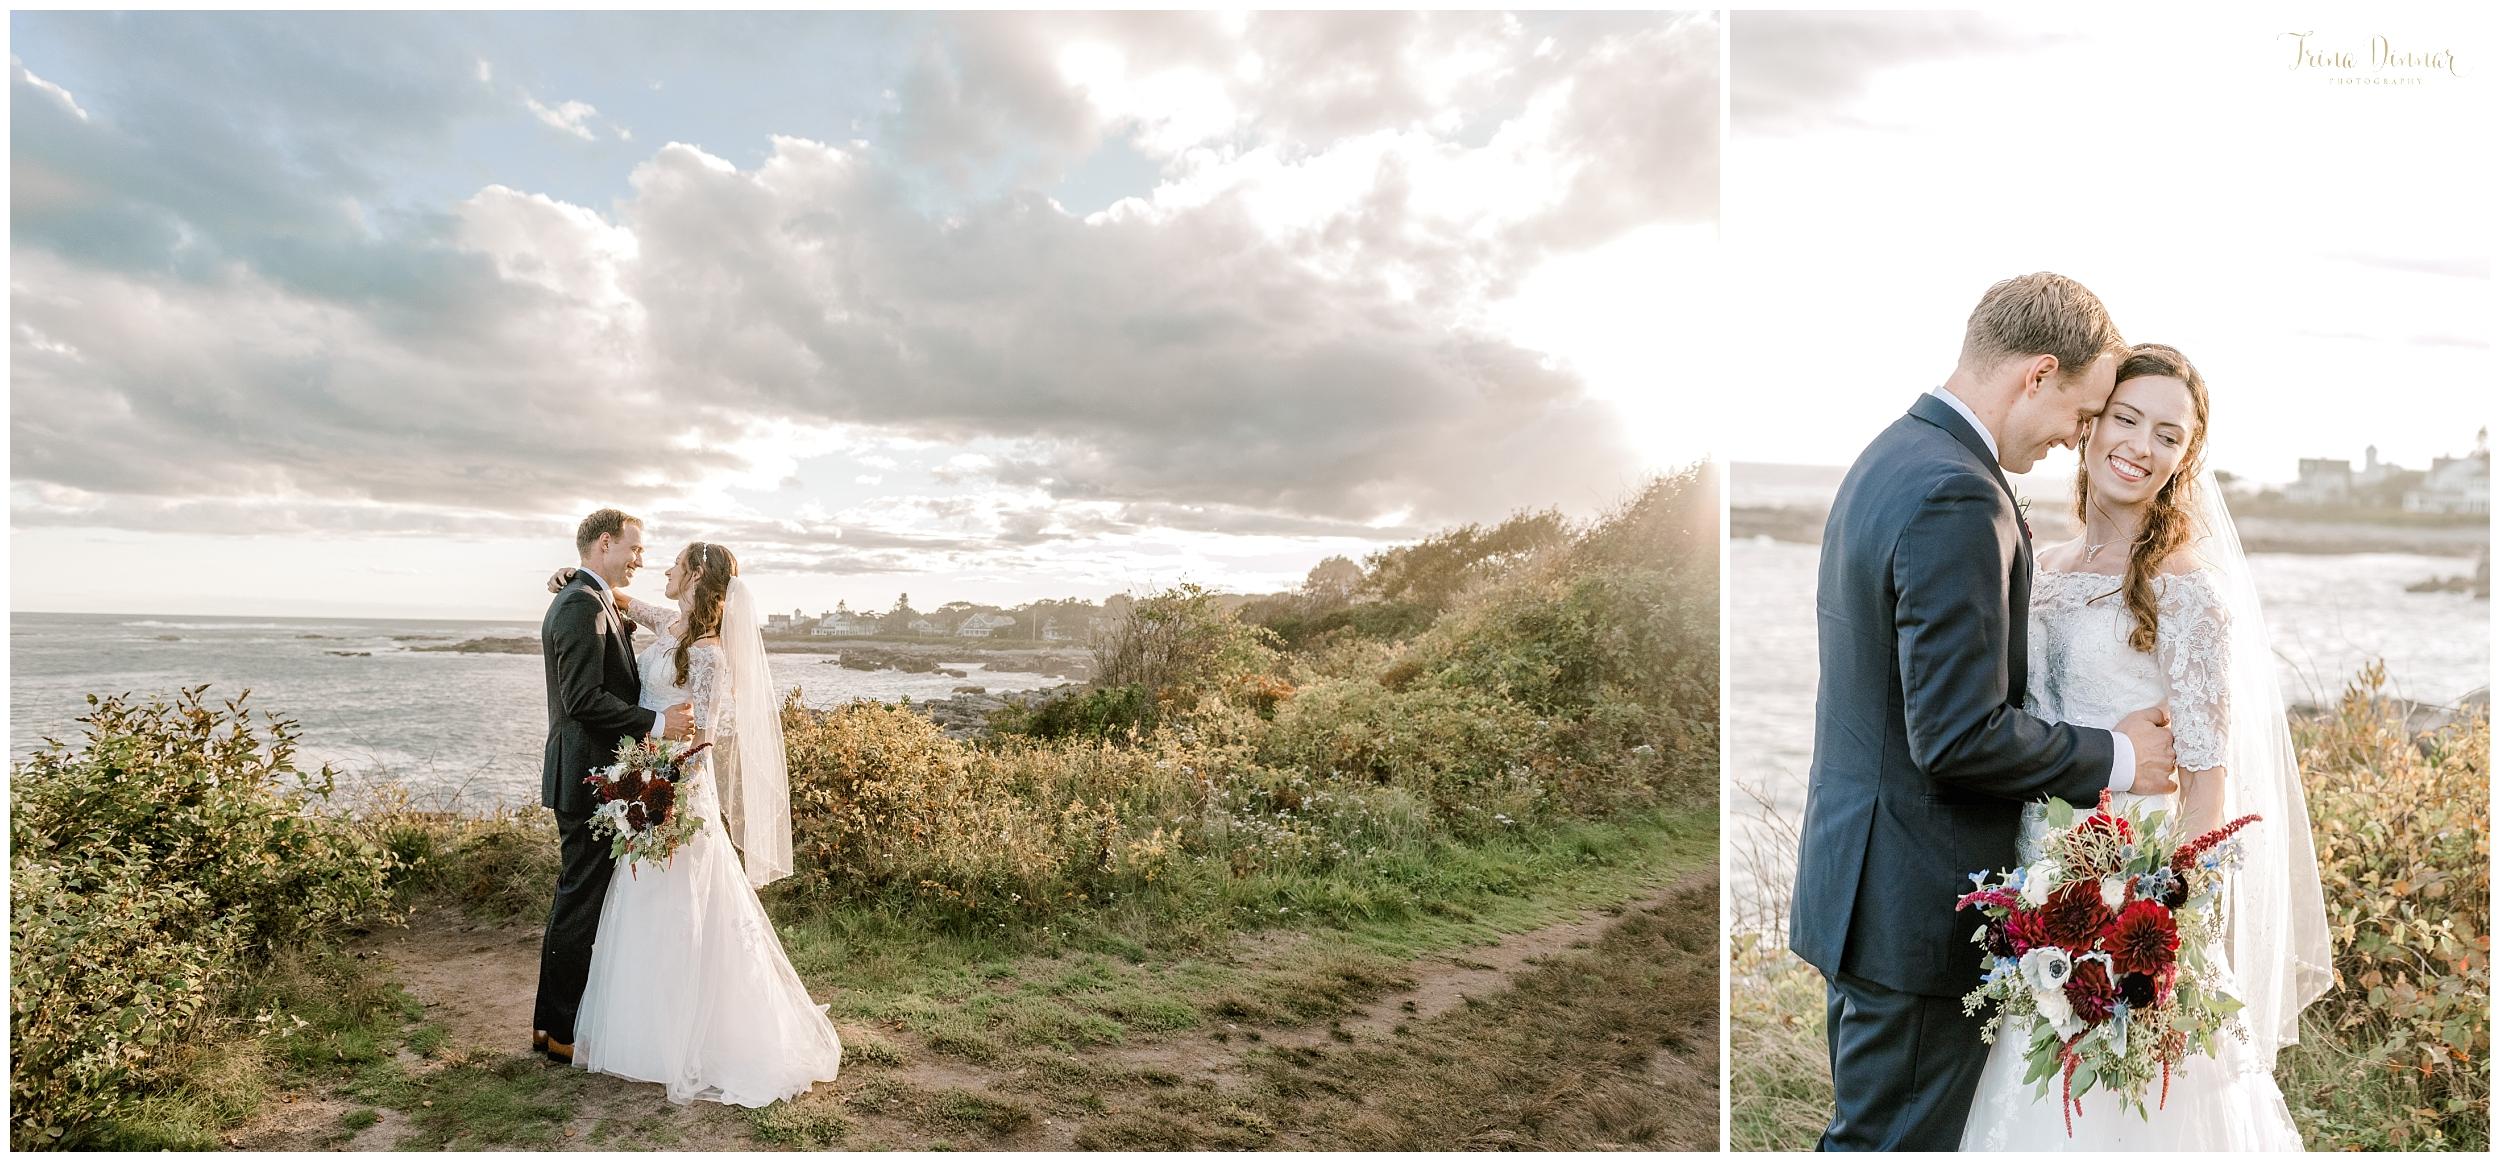 Biddeford Pool Seaside Coastal Wedding Portraits